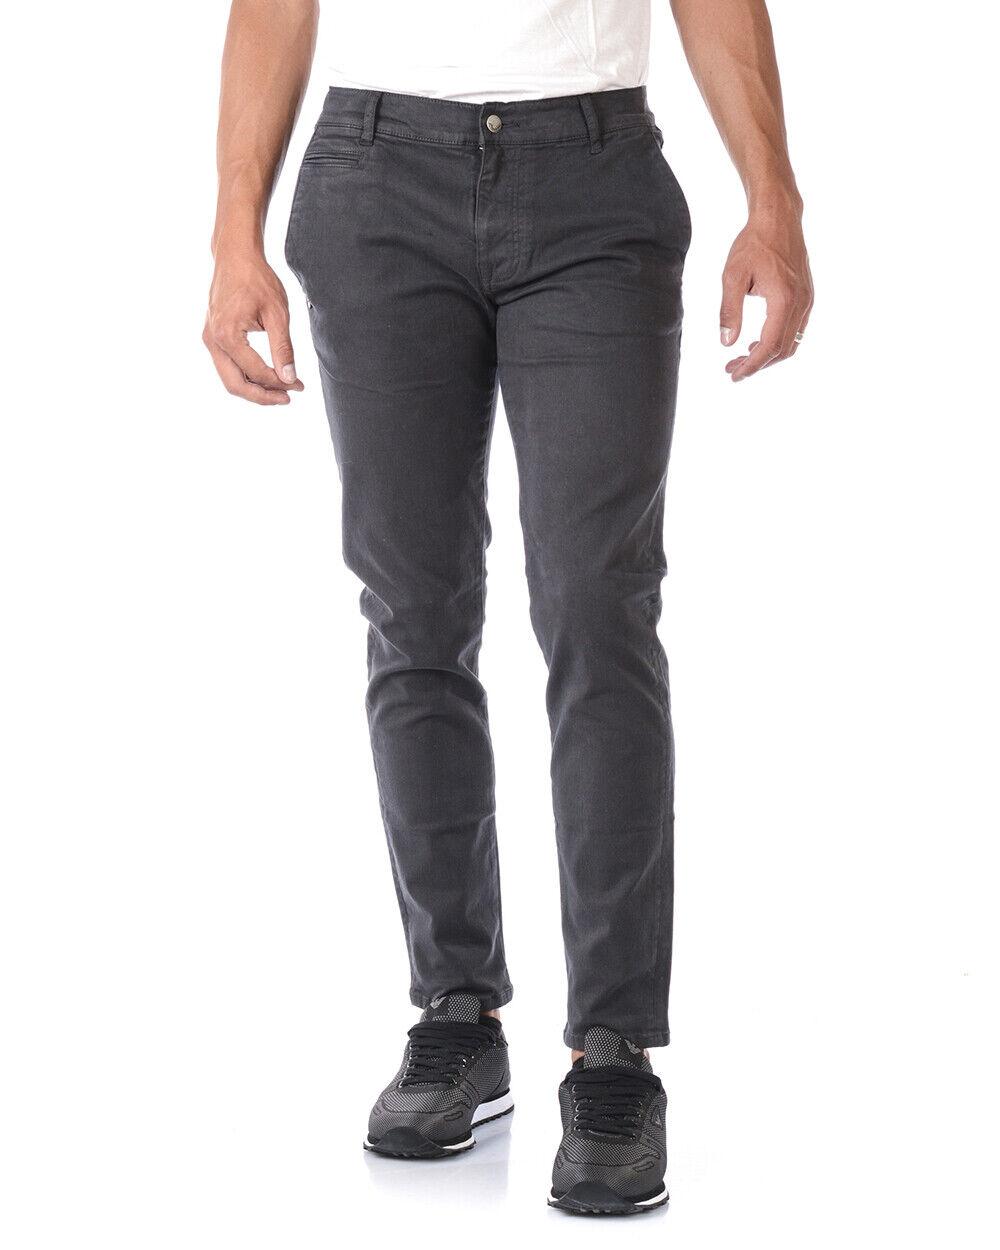 Jeans Daniele Alessandrini men grey PH0013707 10